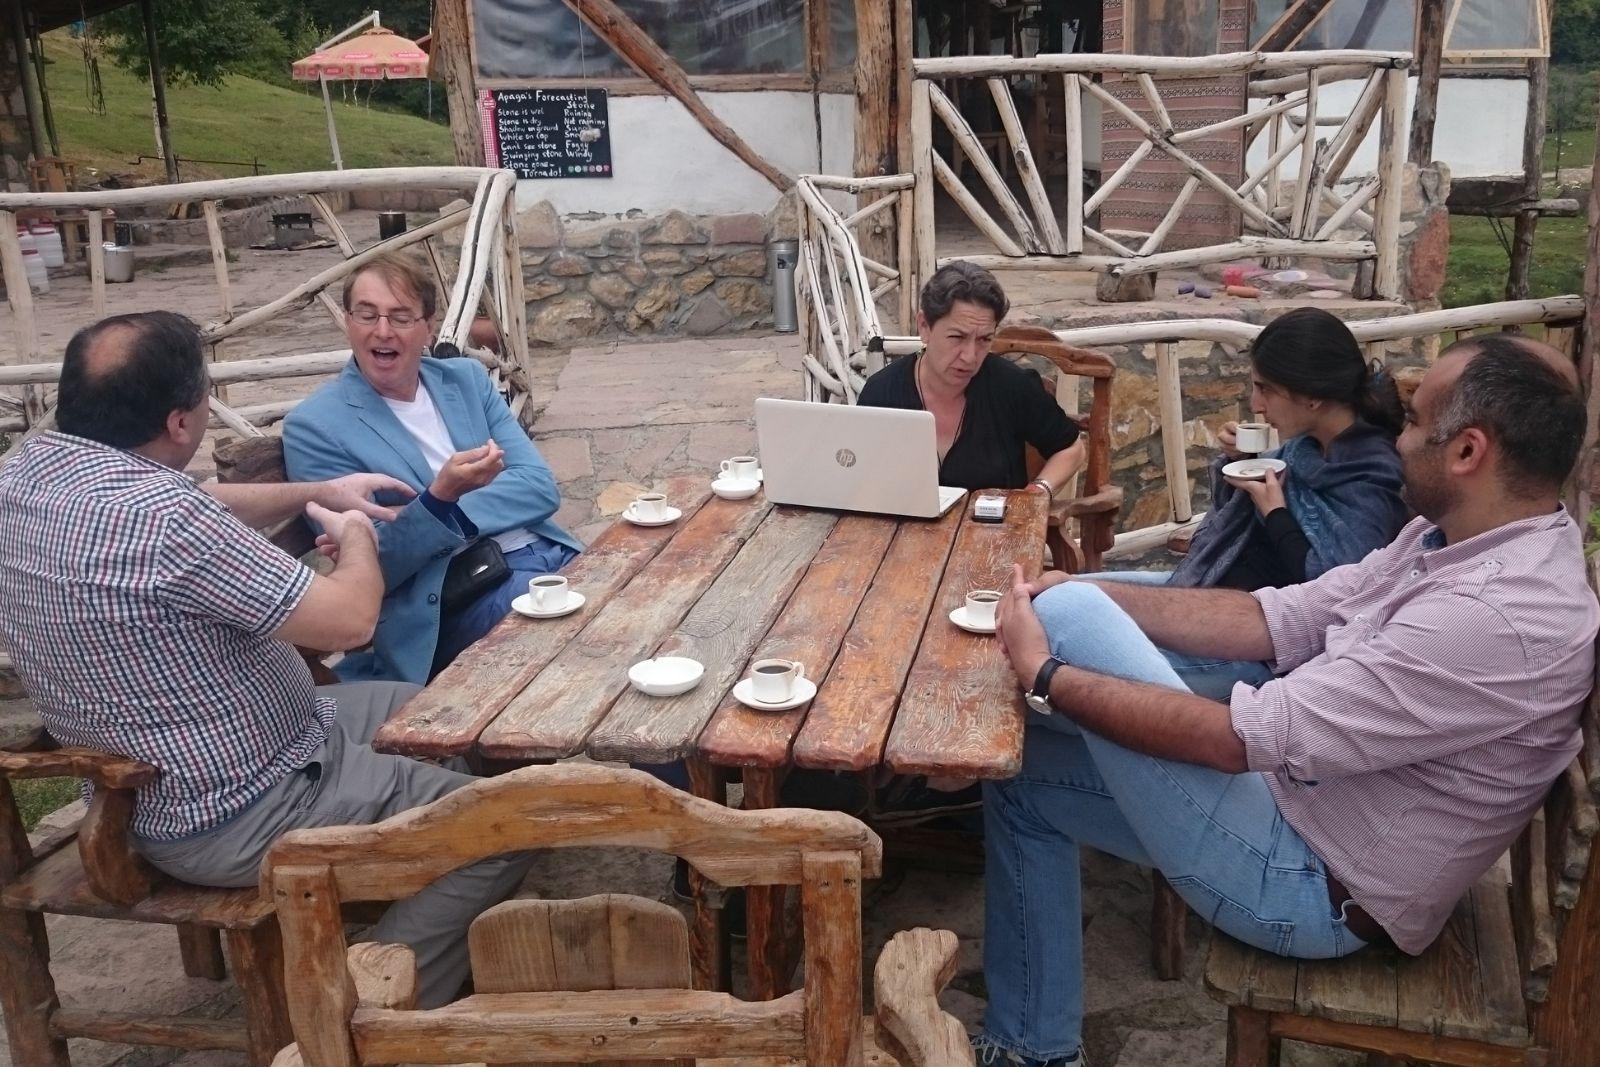 From left to right: Professor Artsruni Sahakyan, participants of Armenian Studies summer school 2015 Rene Bekius and Yana Tchekhanovets, instructor of Armenian language Sona Mnatsakanyan and Gevorg Muradyan